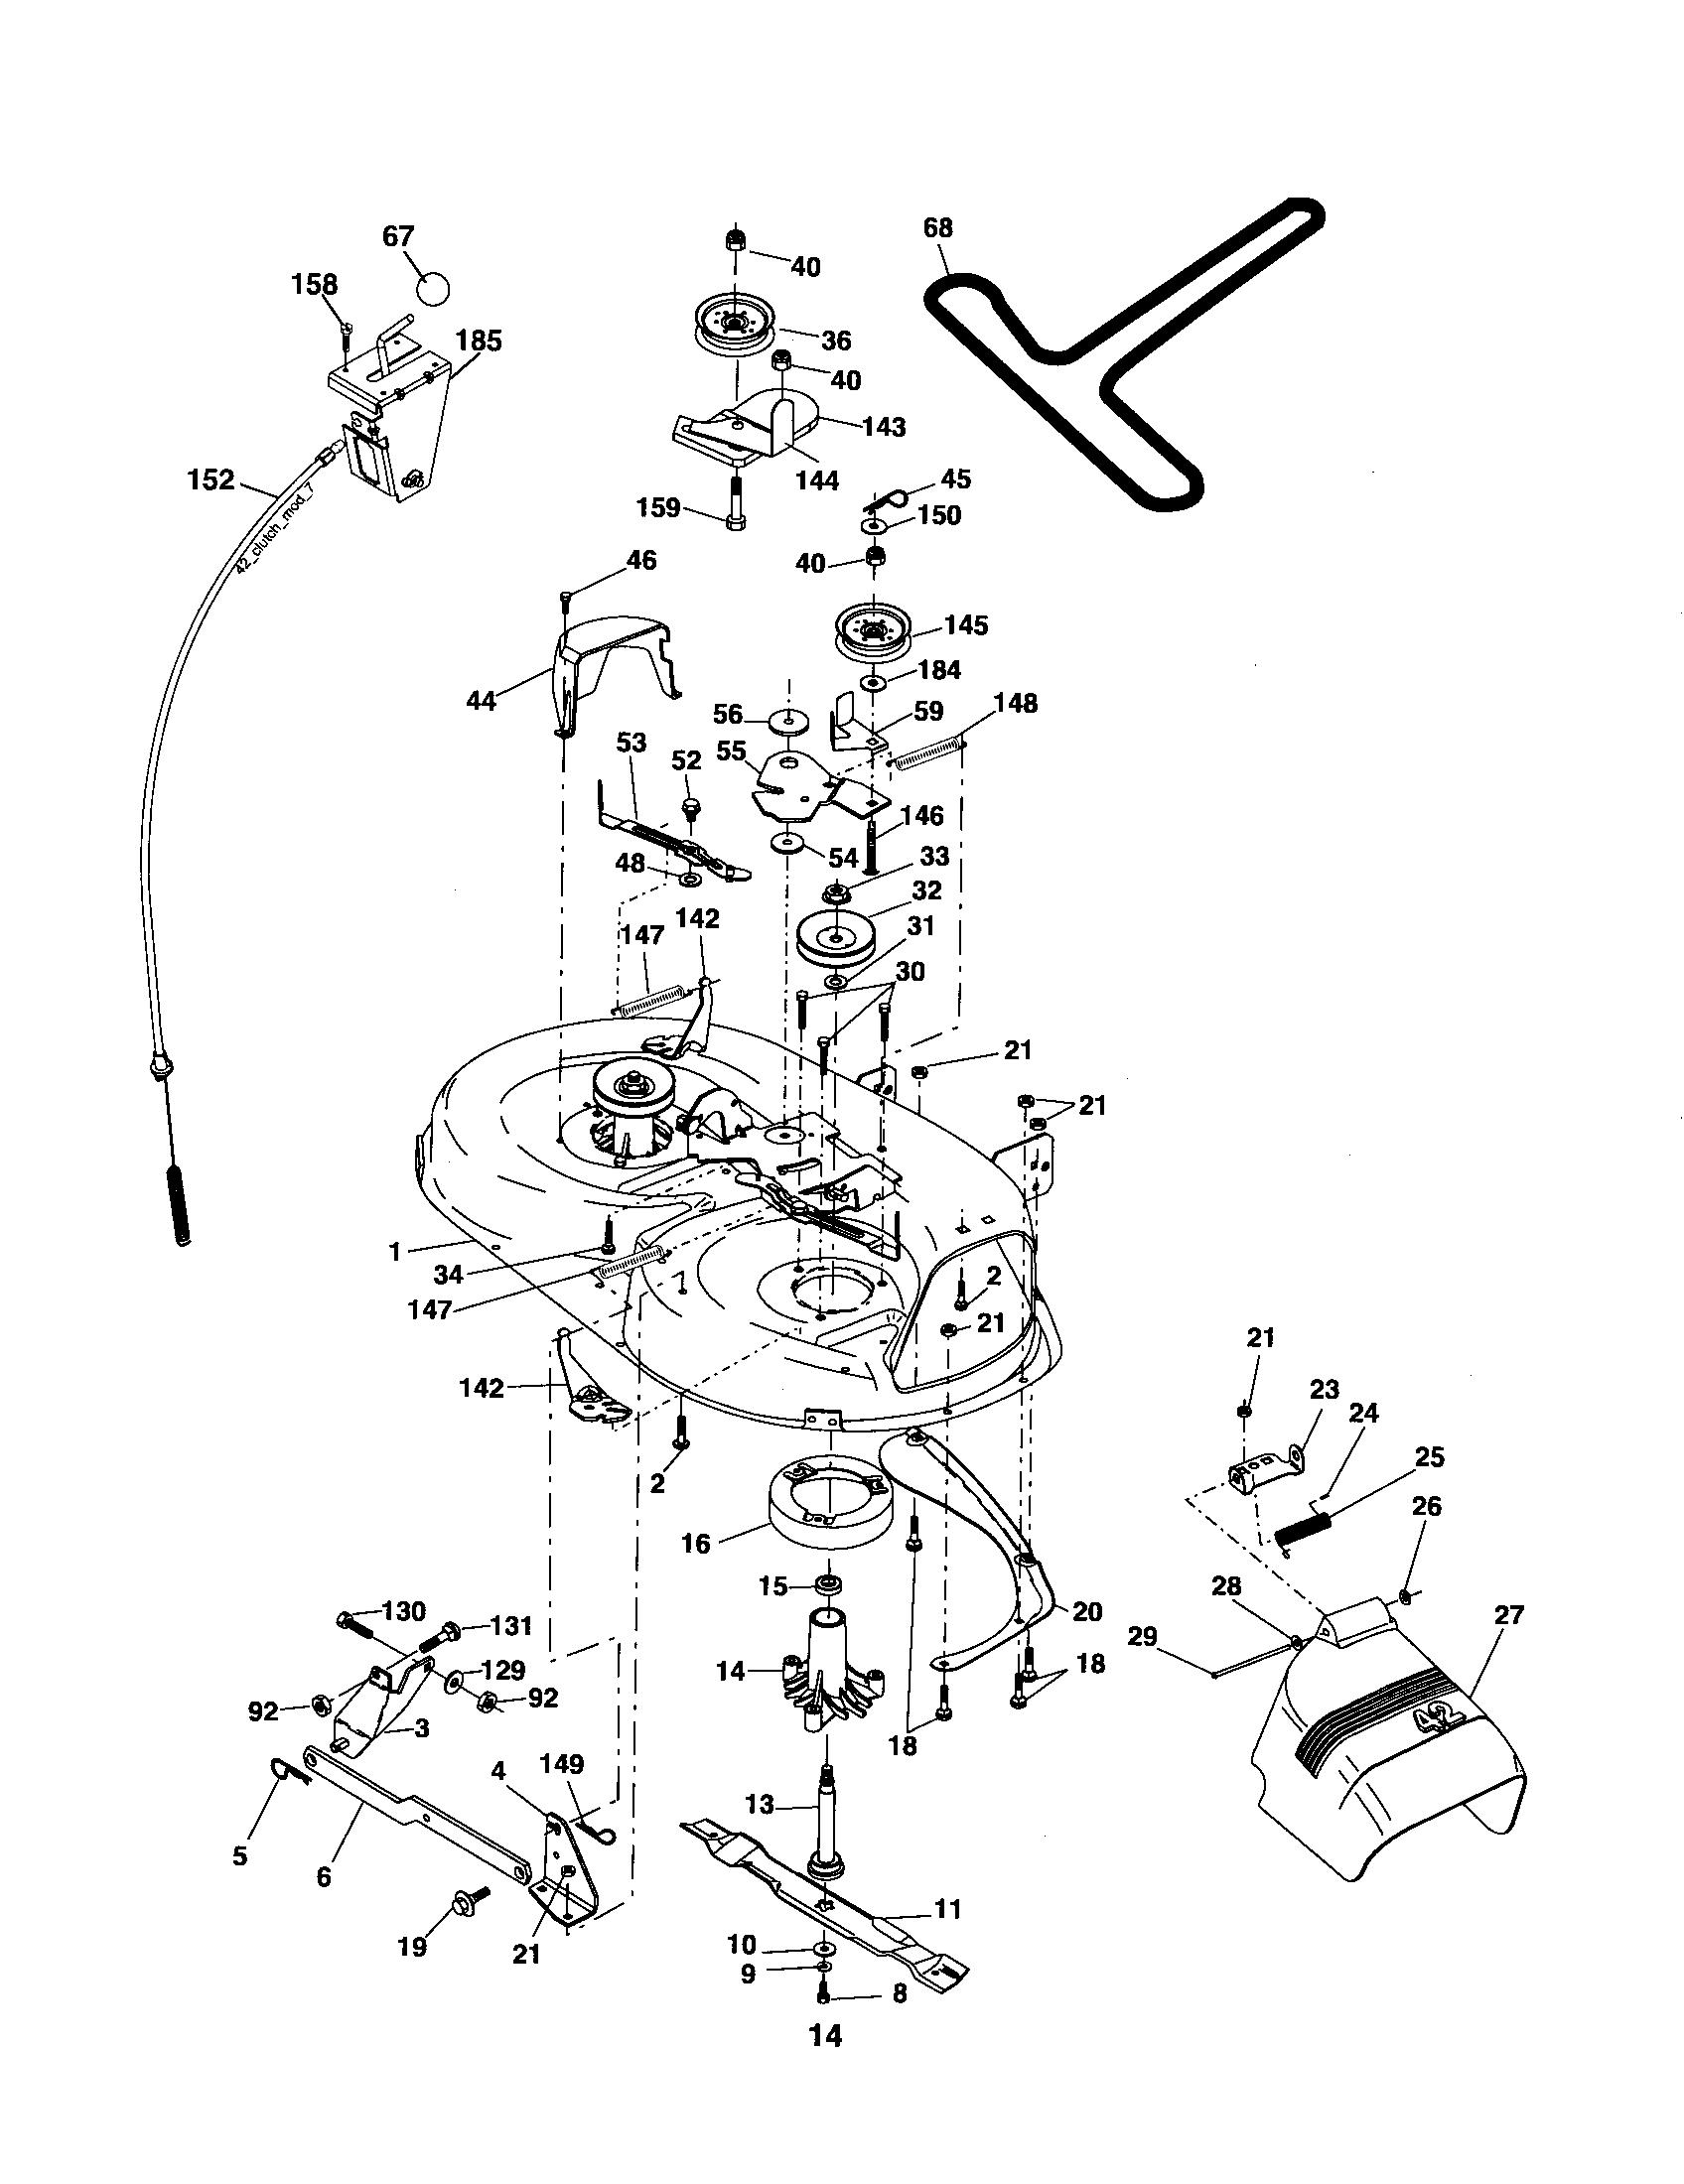 CS_6236] Poulan Lawn Tractor Wiring Diagram Free DiagramExxlu Ivoro Rect Mohammedshrine Librar Wiring 101